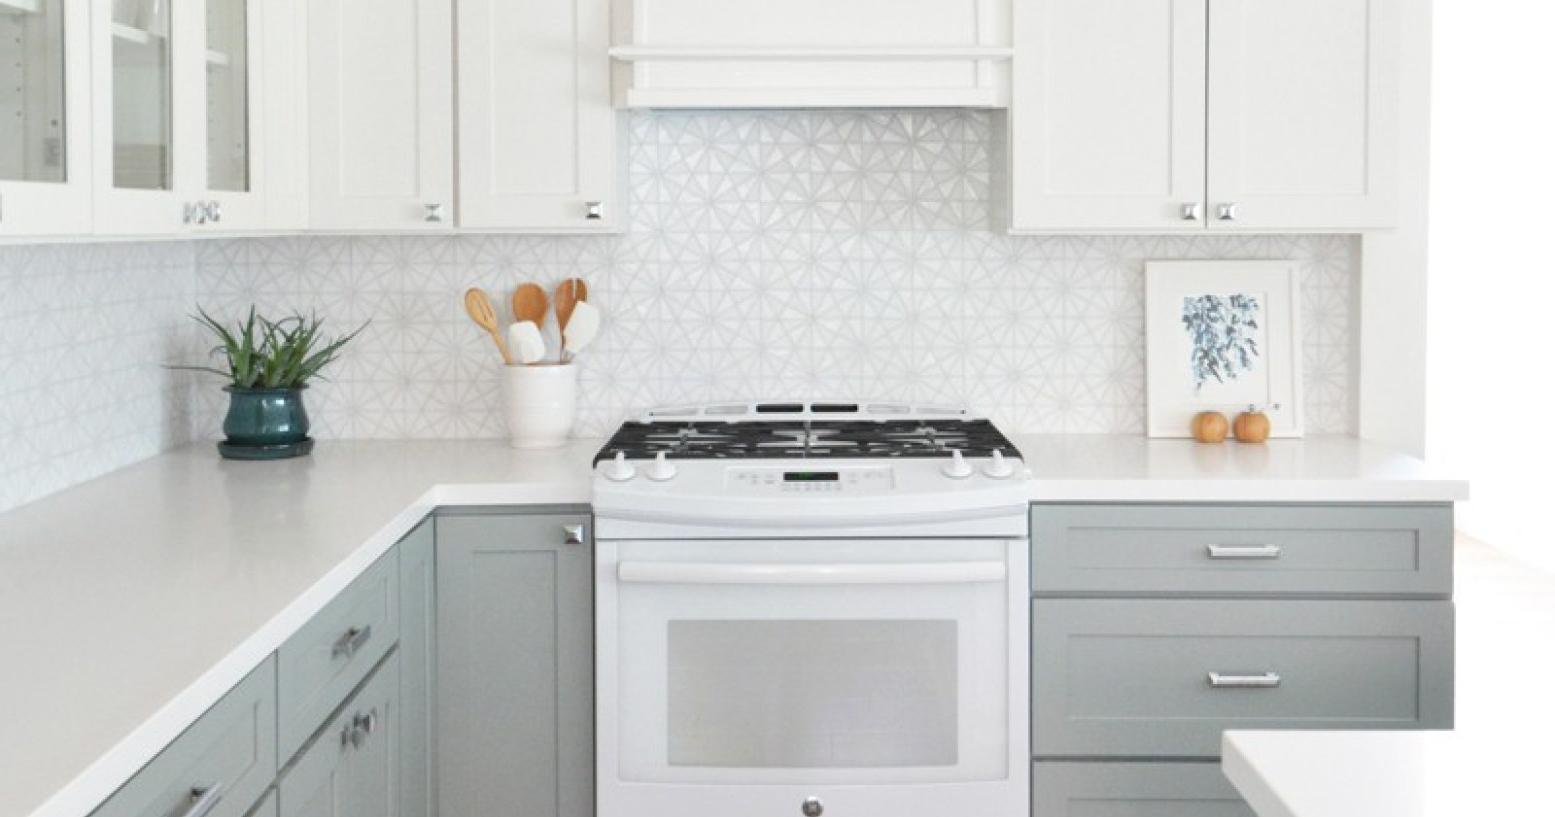 kitchen cabinet ideas with white appliances photo - 2